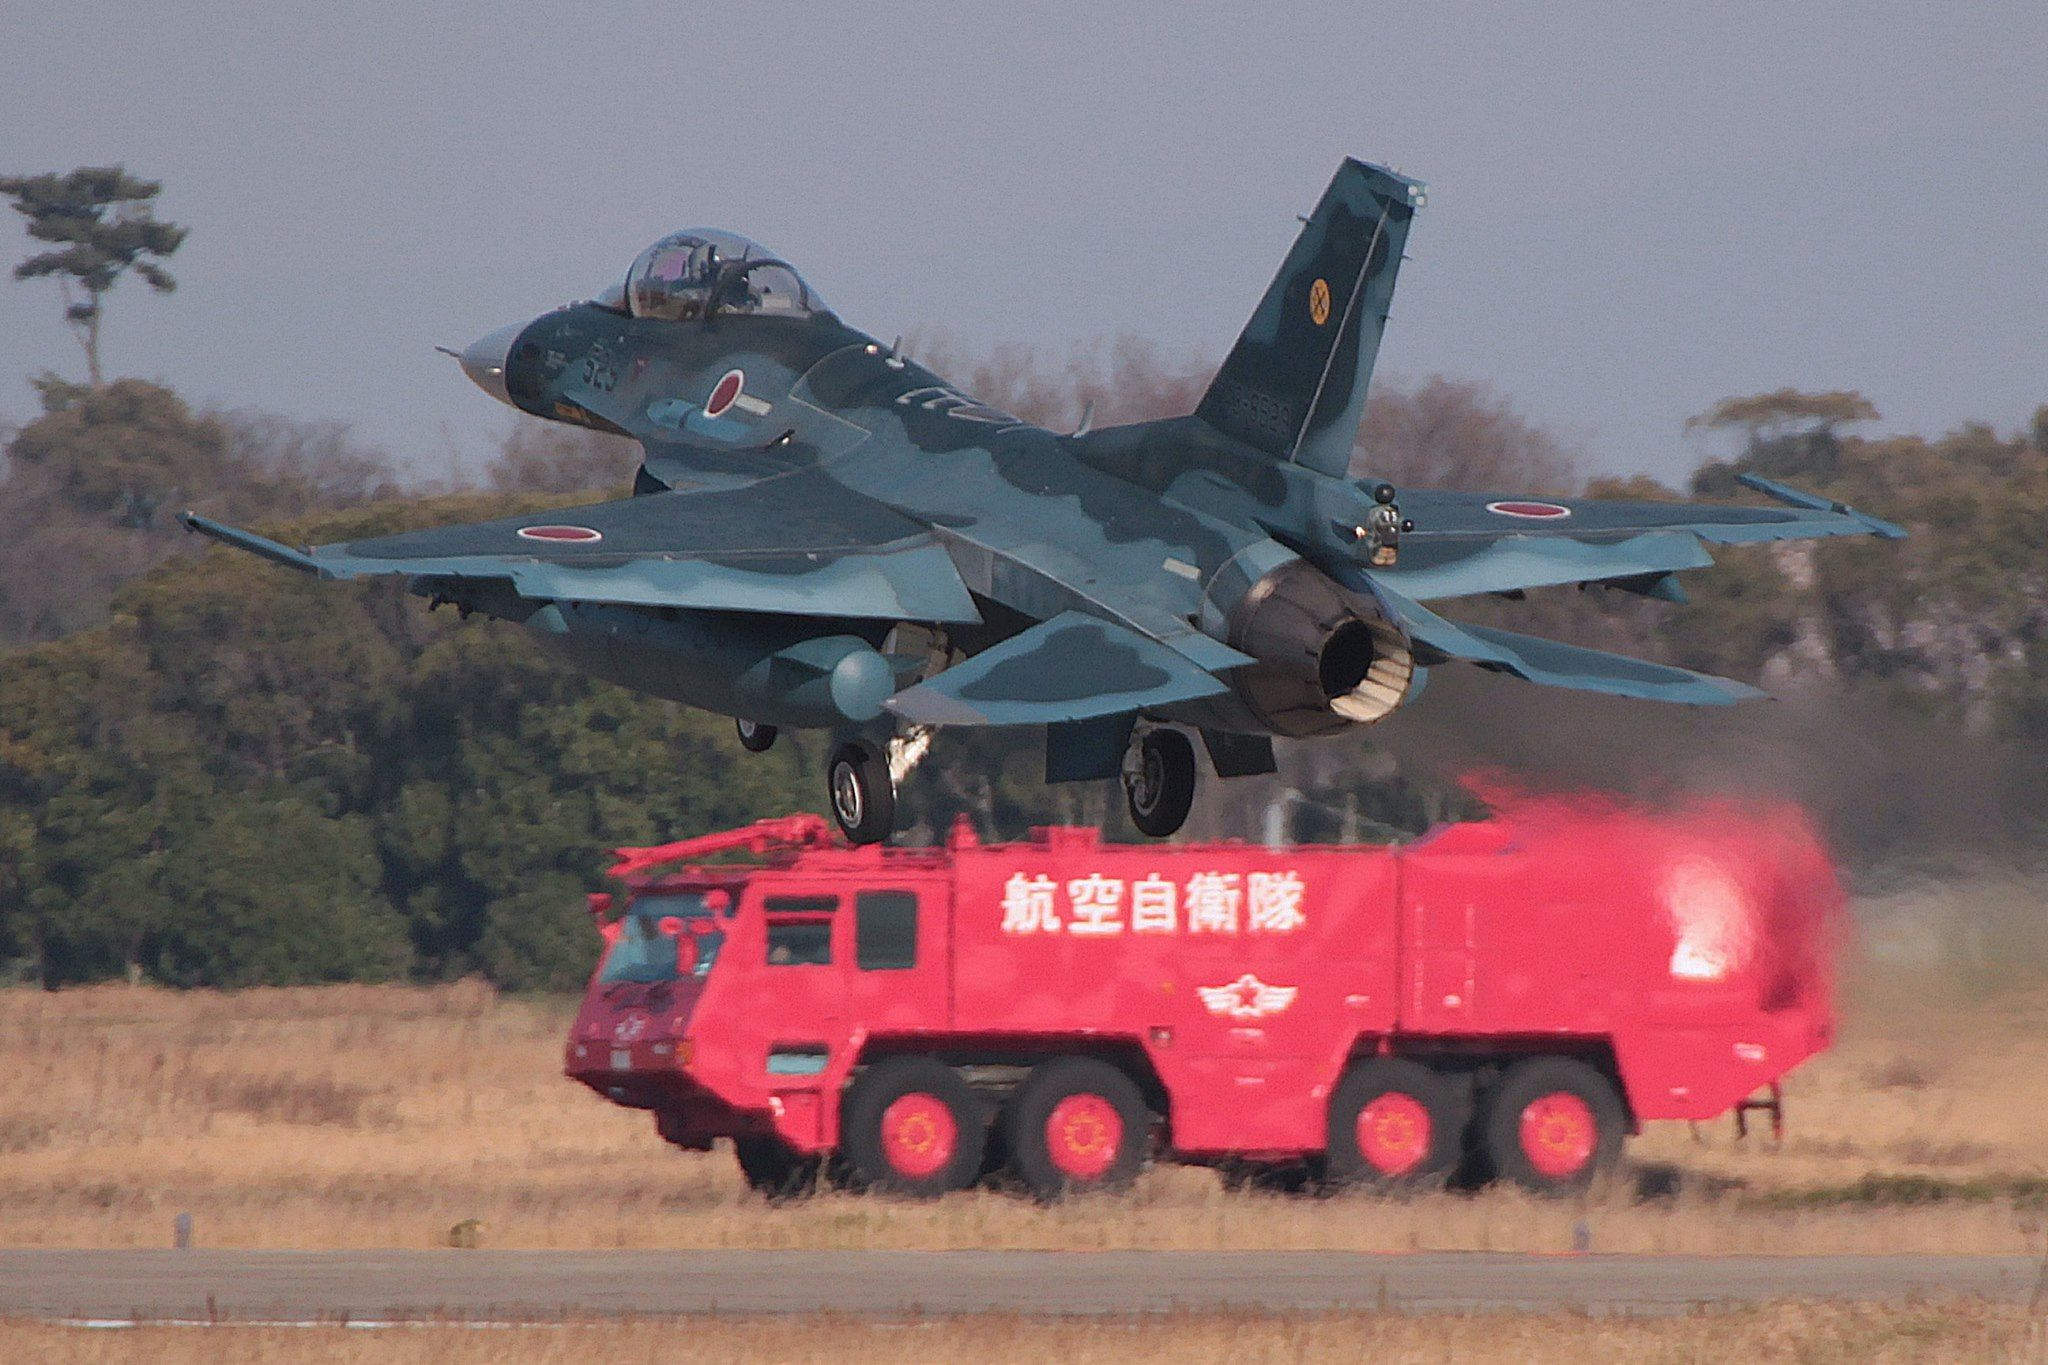 F-2 Mitsubishi Japan  https://www.facebook.com/BuruinparusuZhuChengJiDenoKong?fref=photo